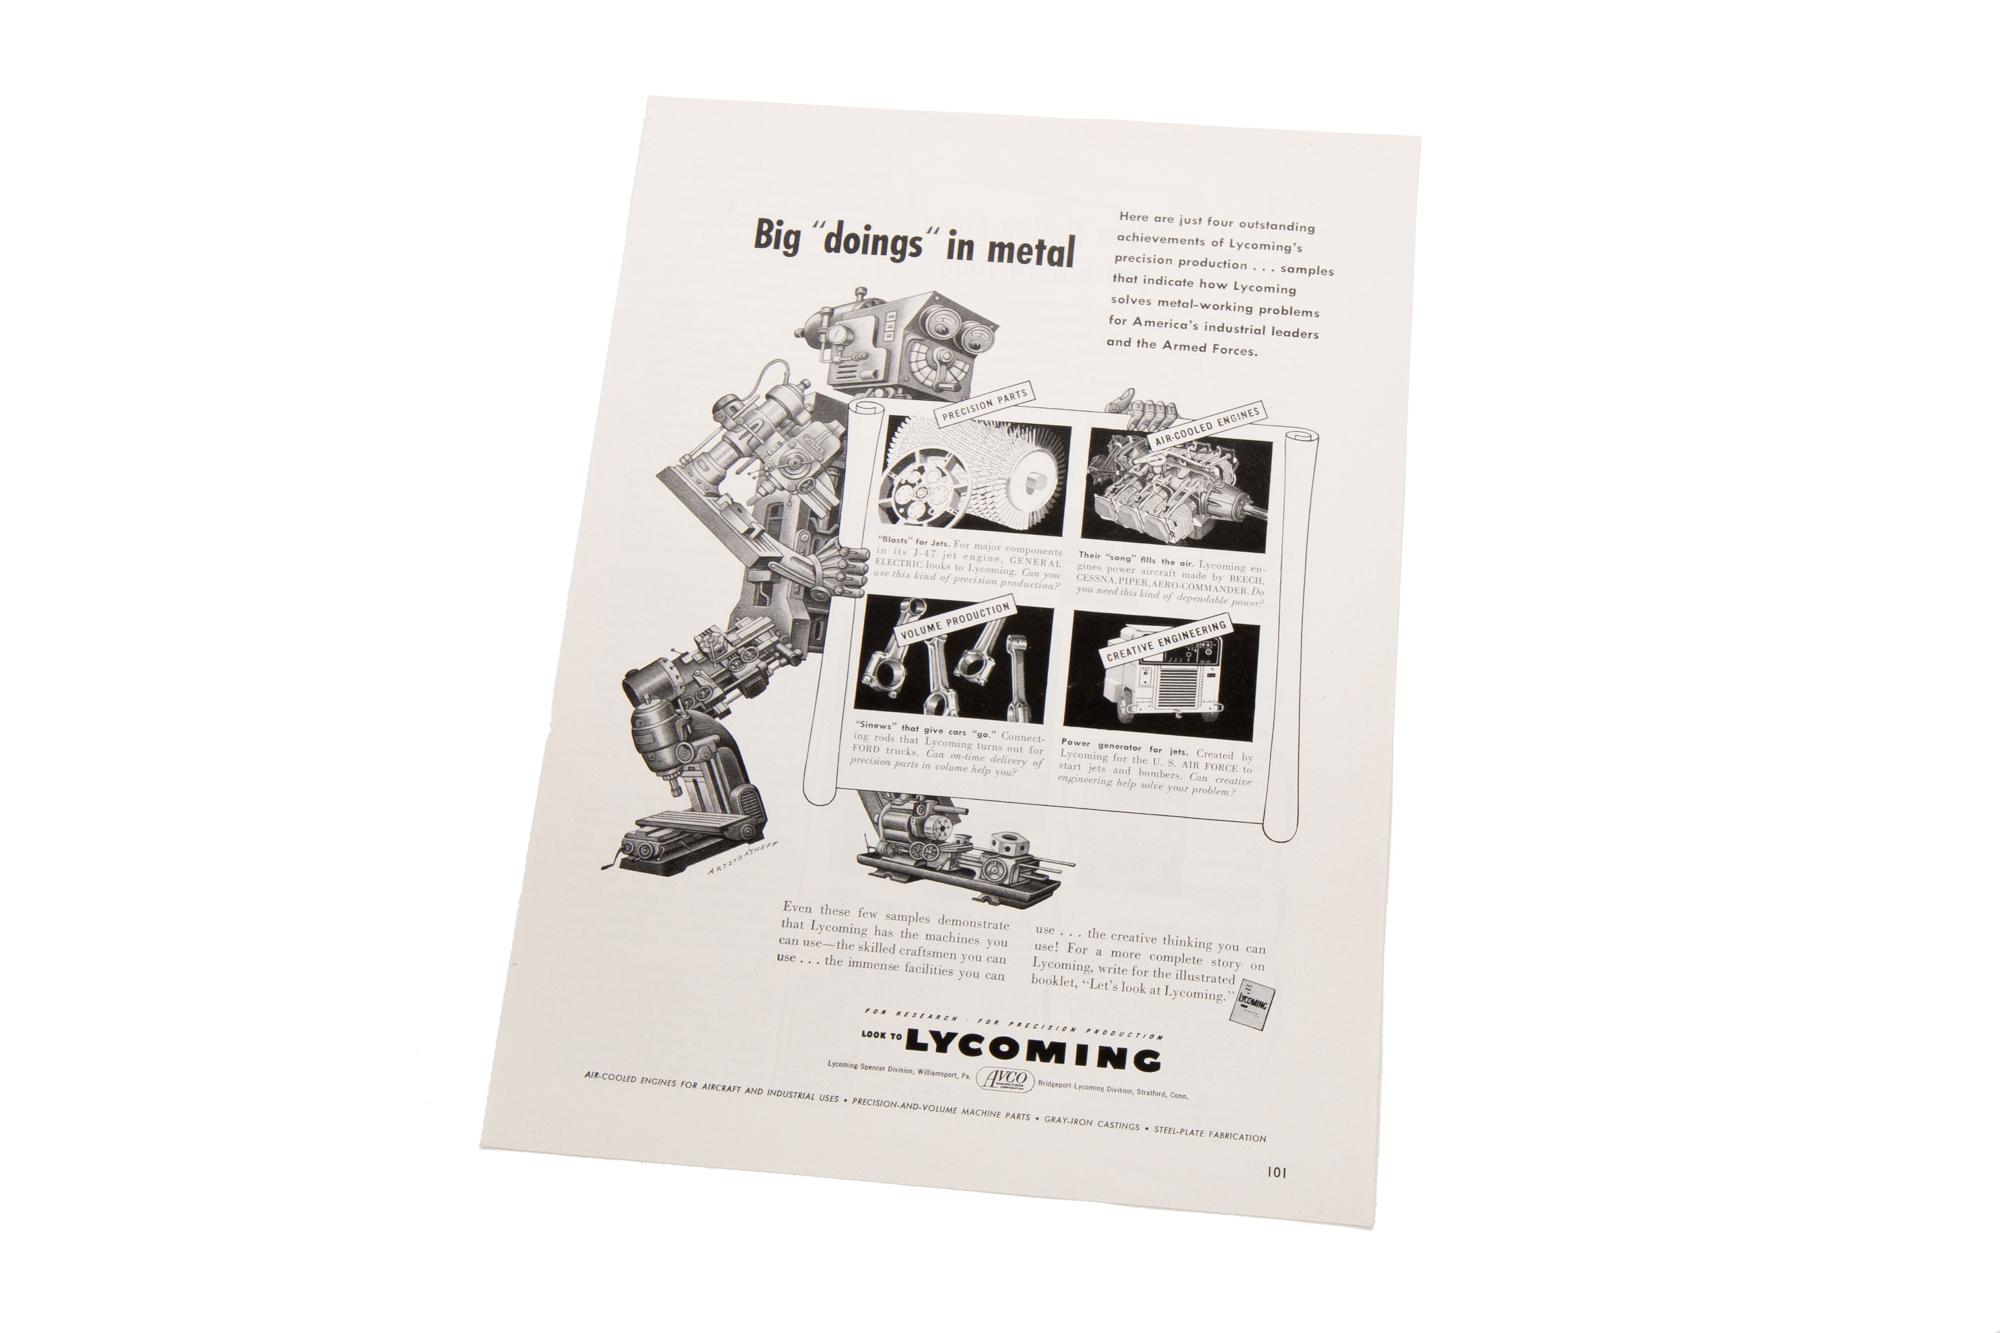 Magazine Advertisement – Lycoming (Illustration by Artzy Basheff circa 1953)